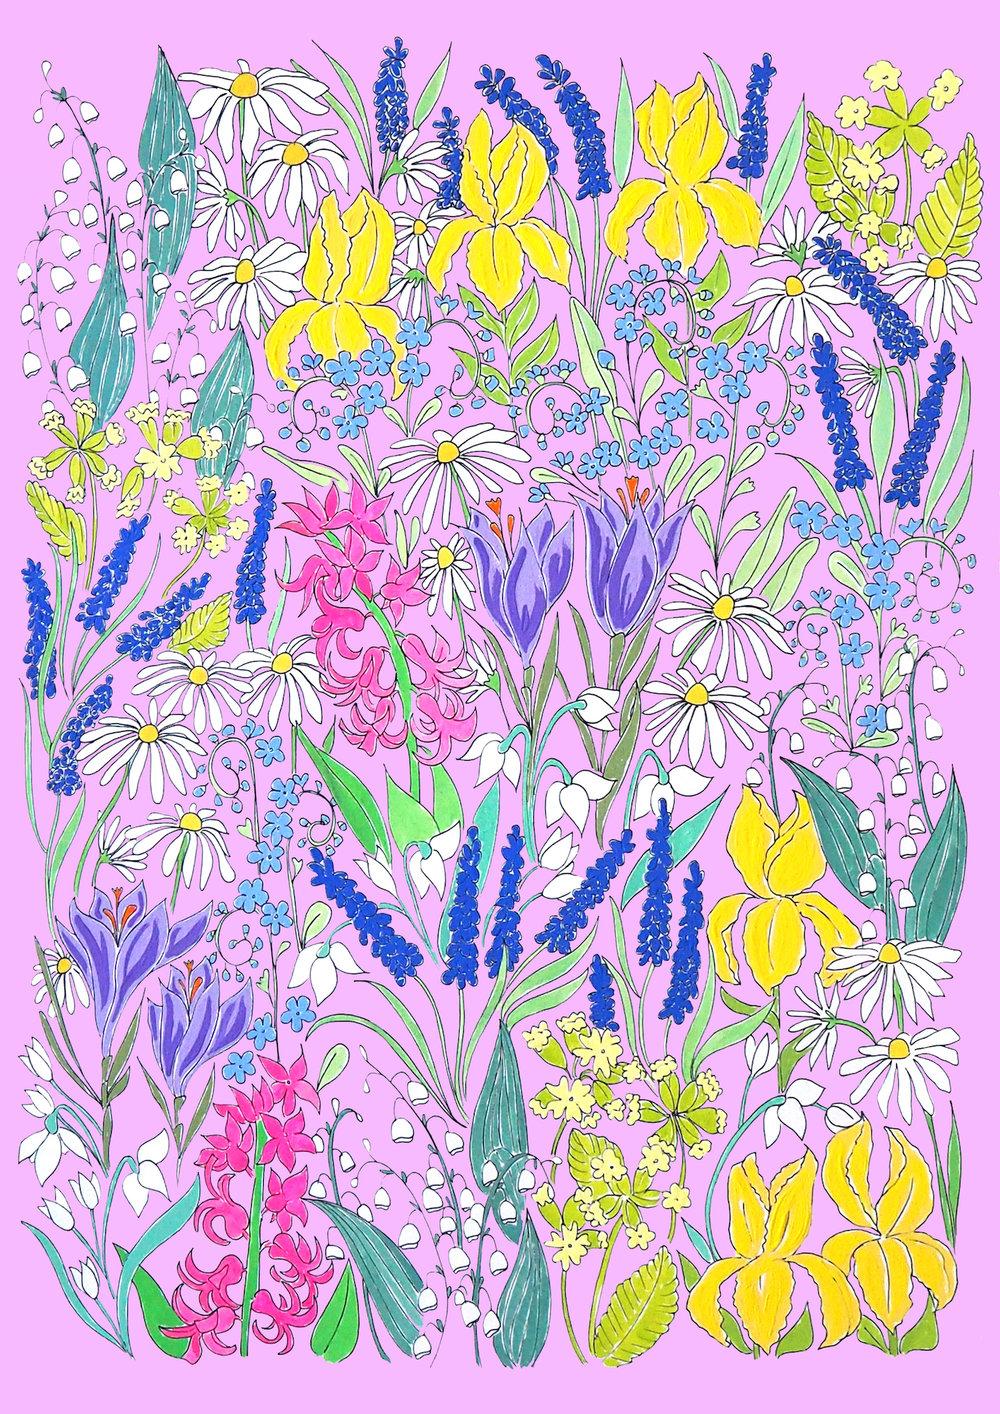 Spring flowers background pink.jpg